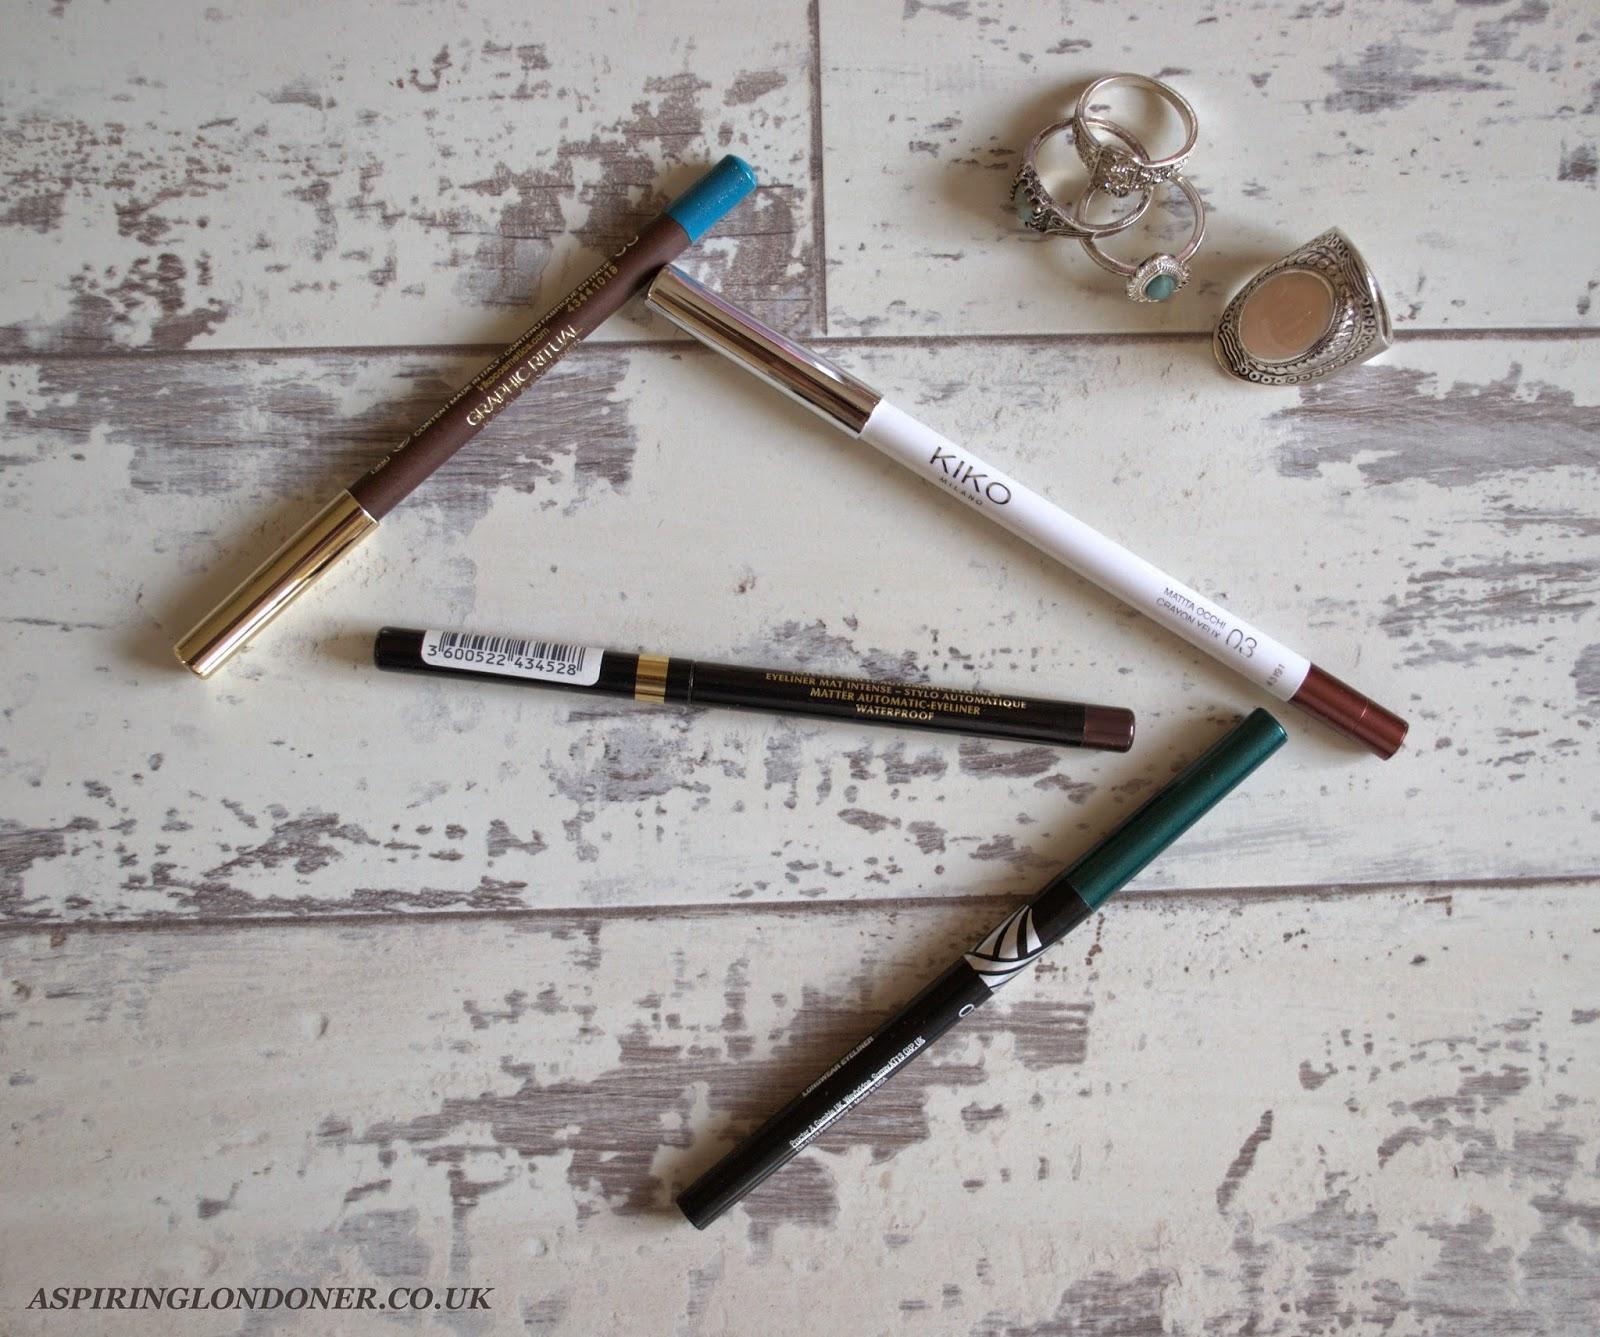 Colour Eyeliners For Brown Eyes ft Kiko, Loreal, Max Factor - Aspiring Londoner